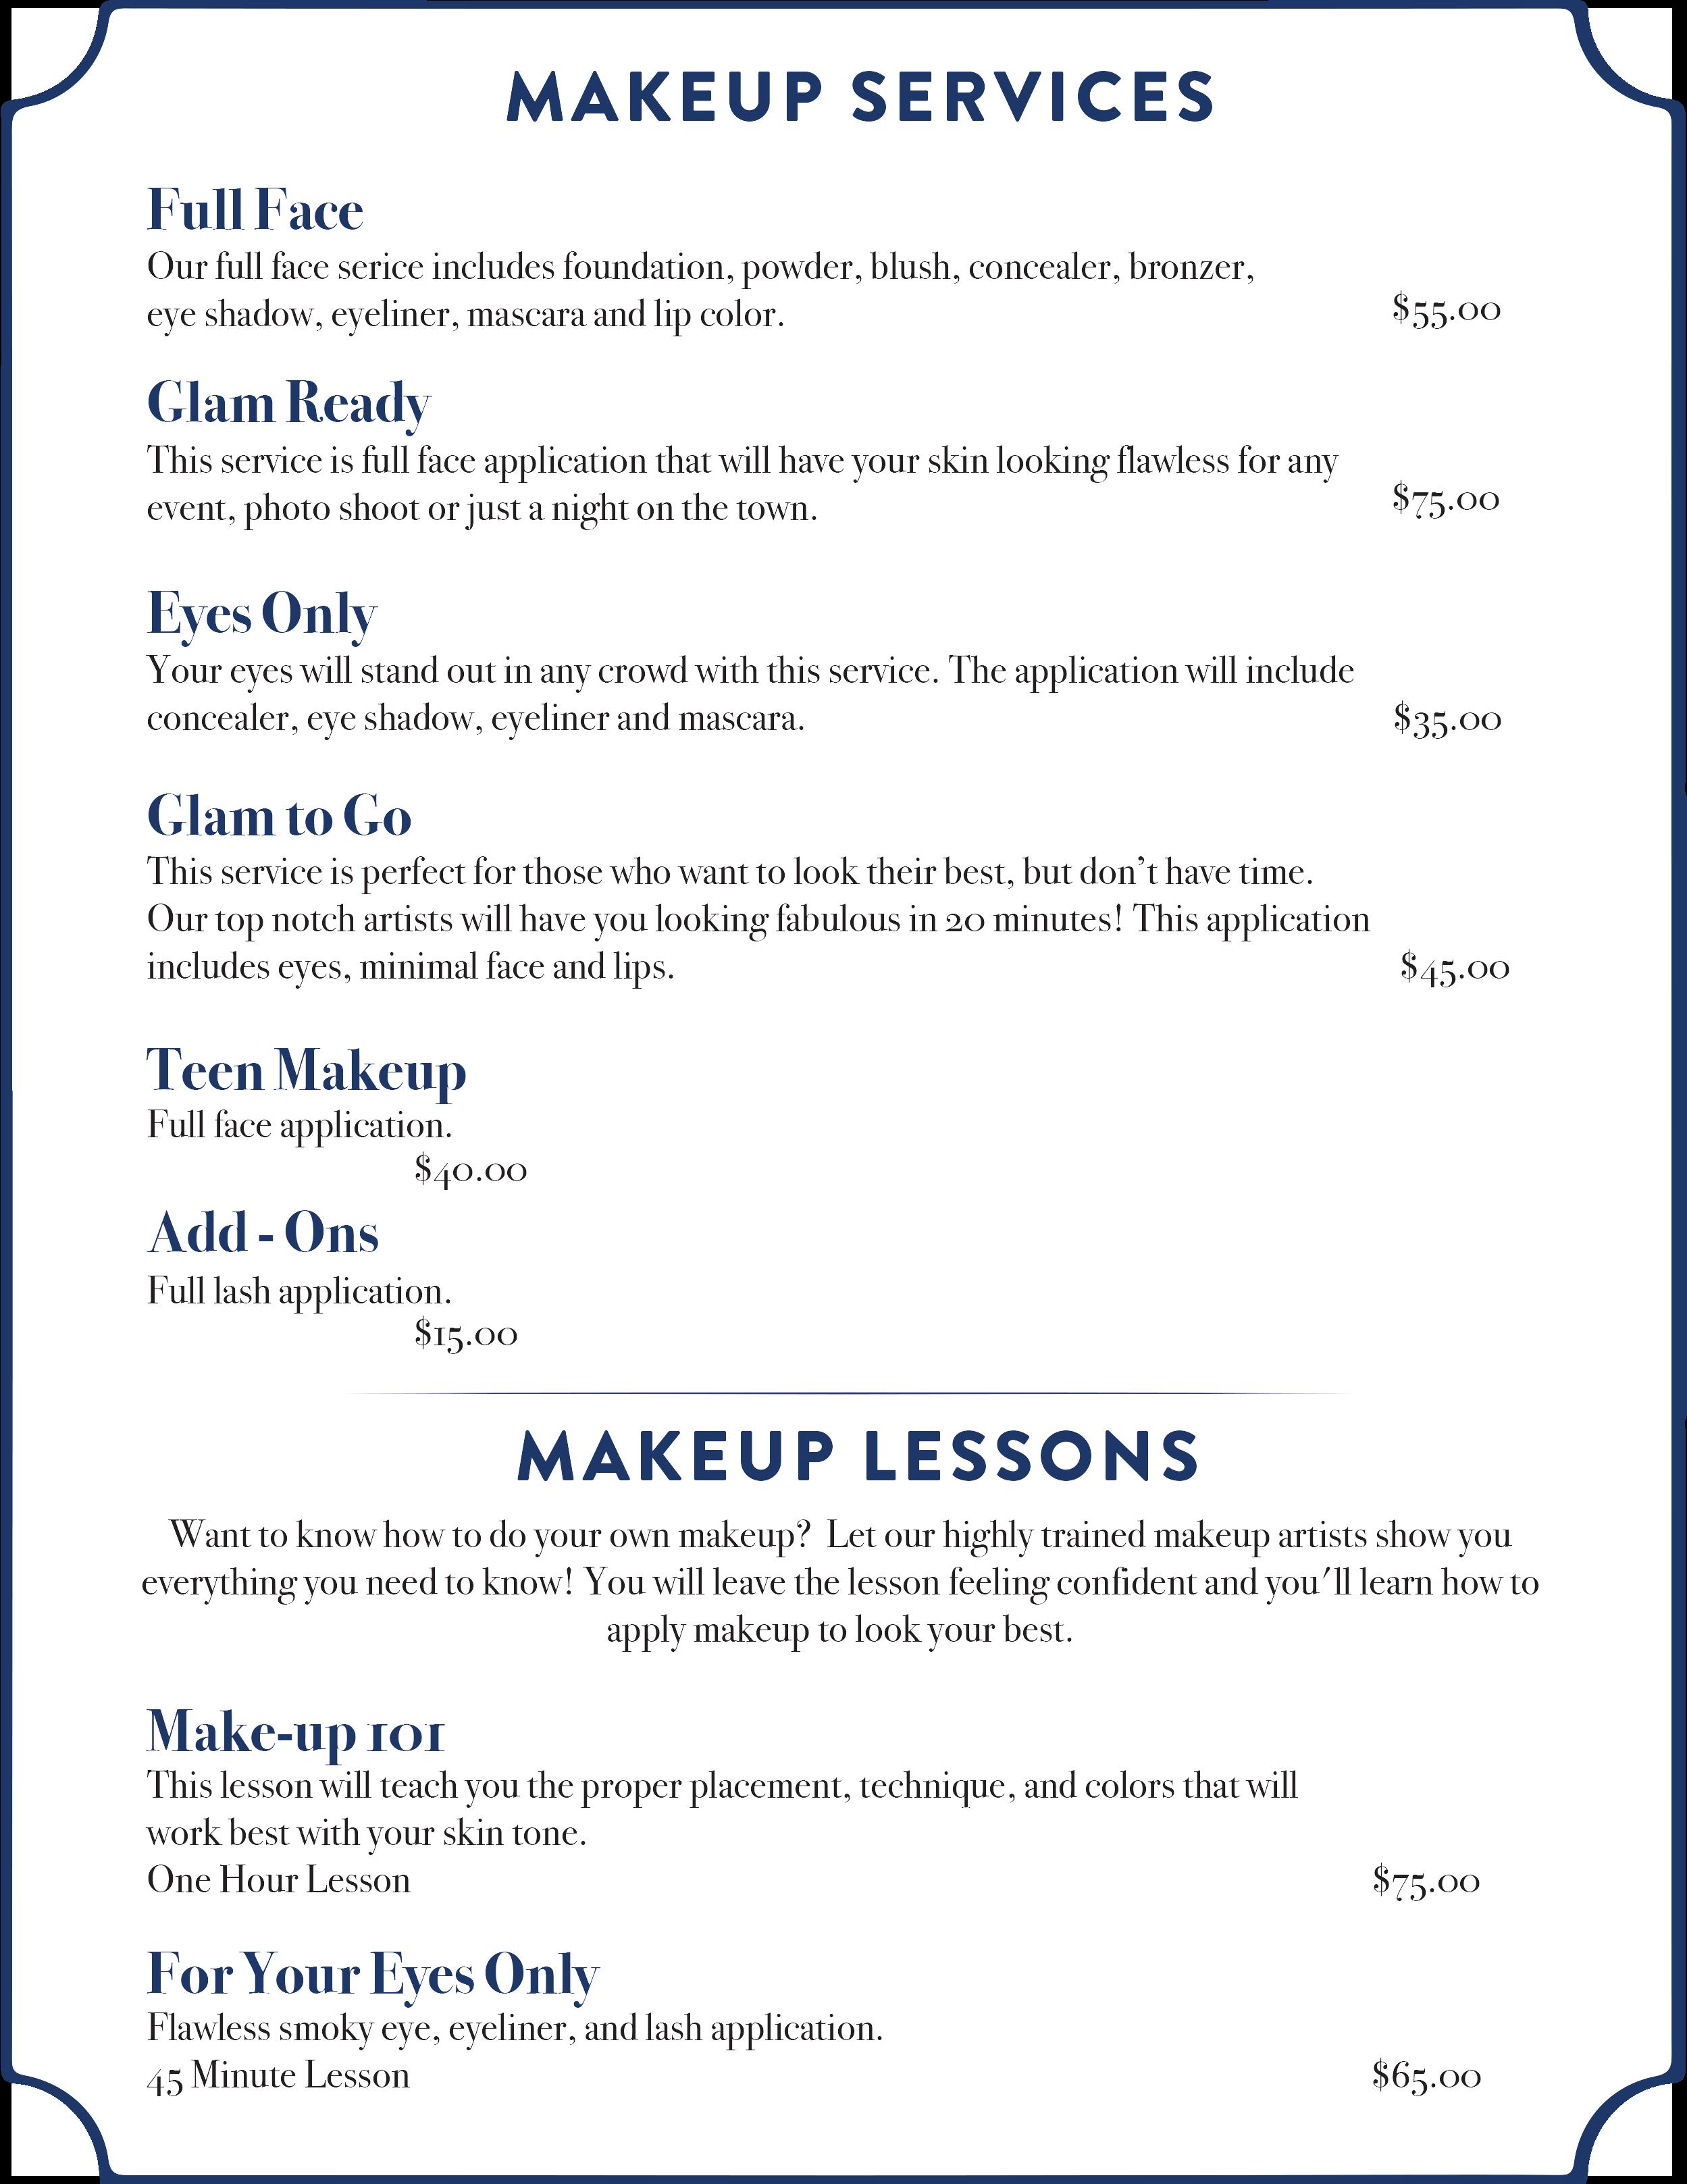 makeup services 8.10.17 3.png